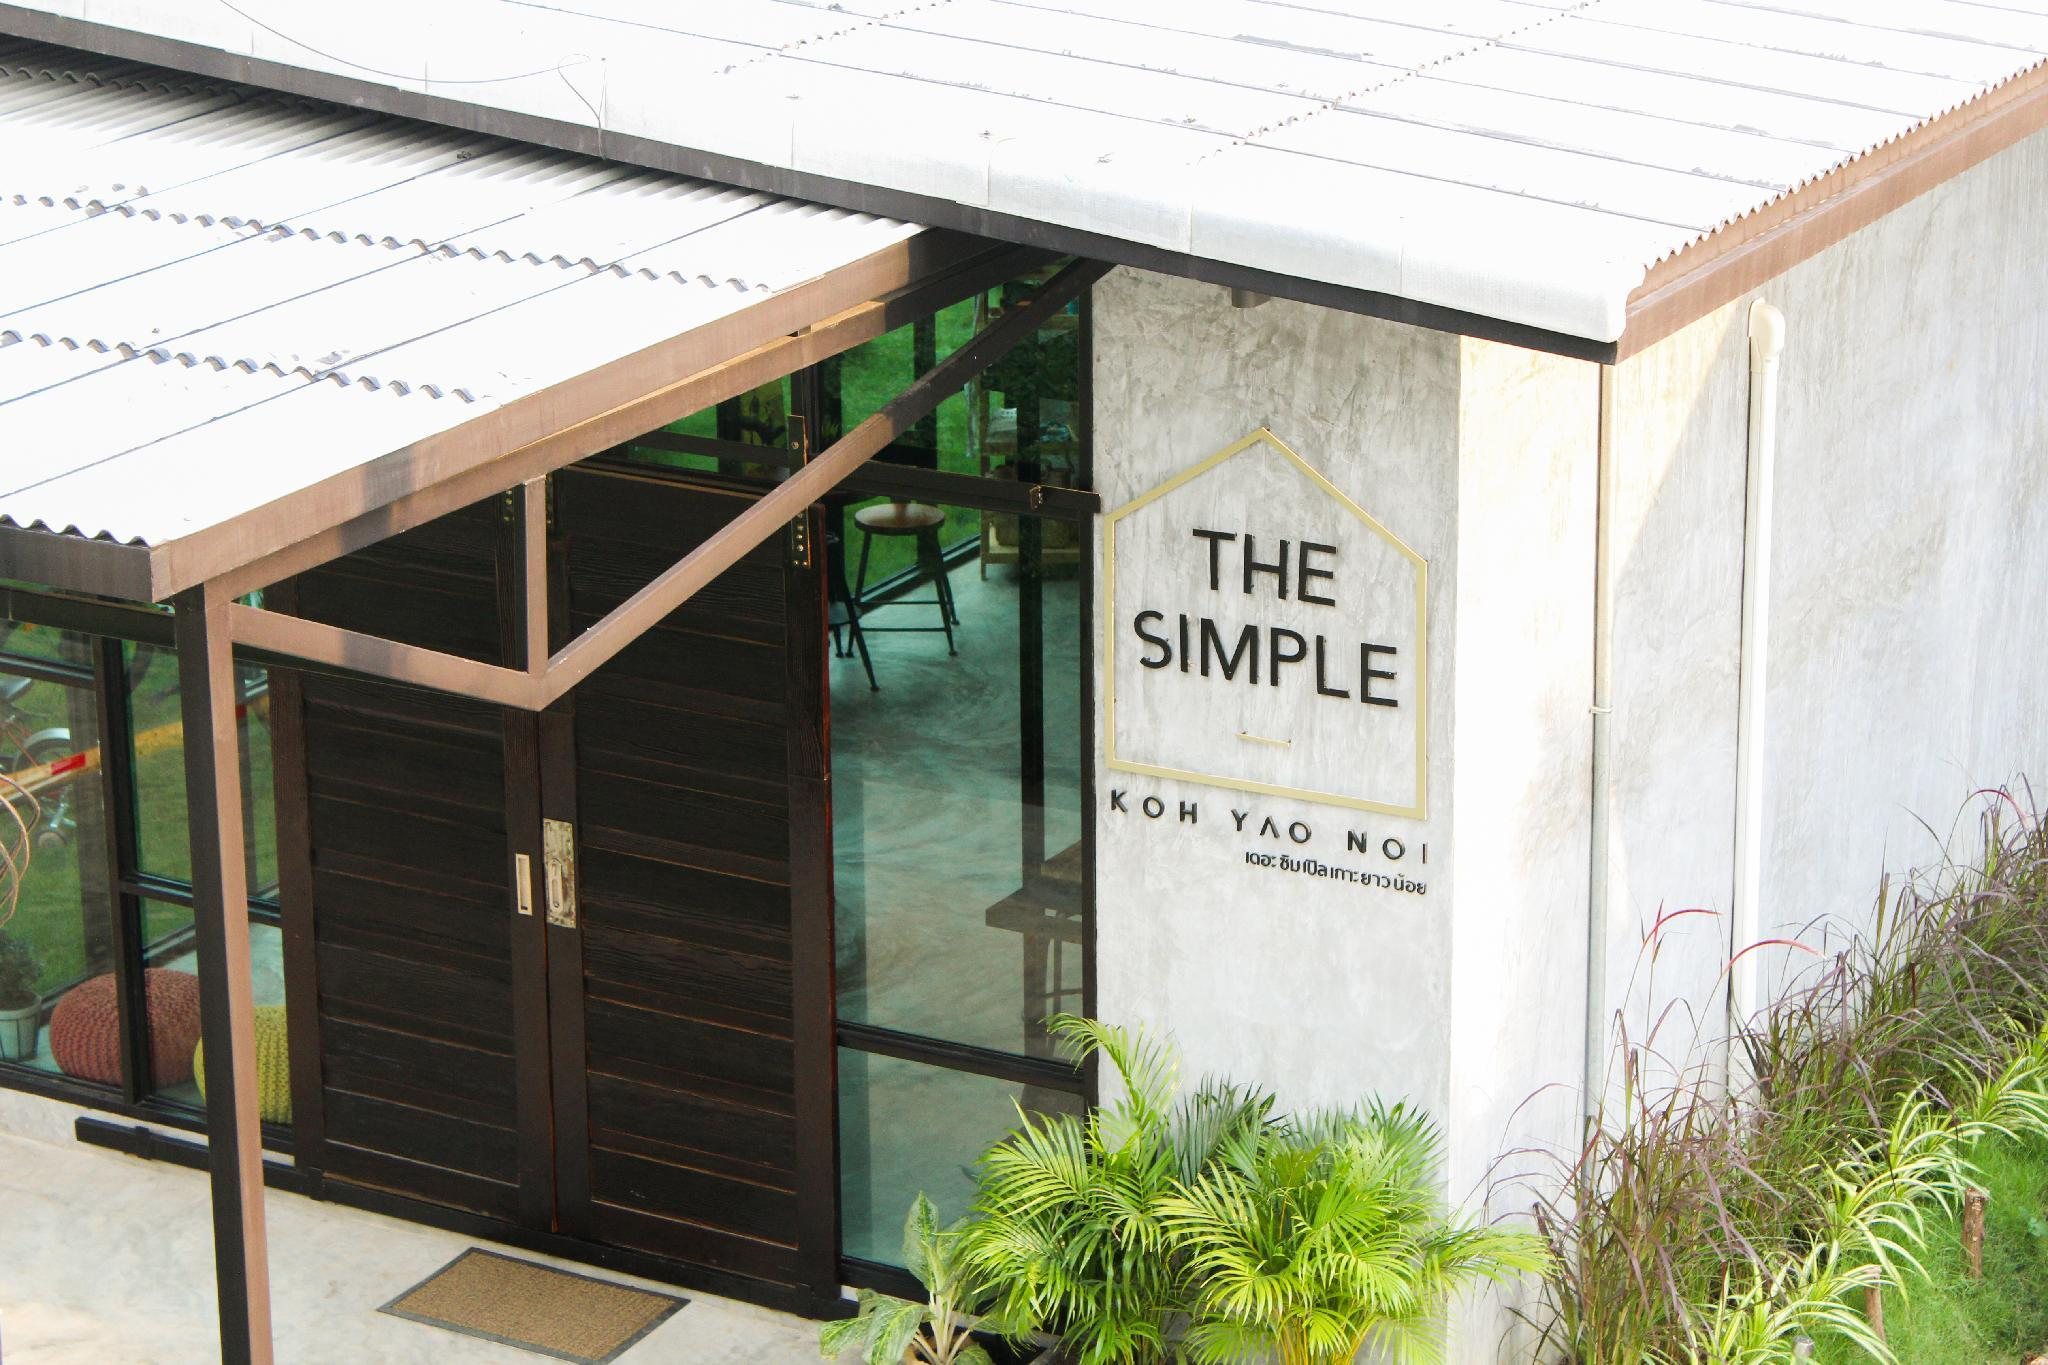 The Simple Koh Yao Noi